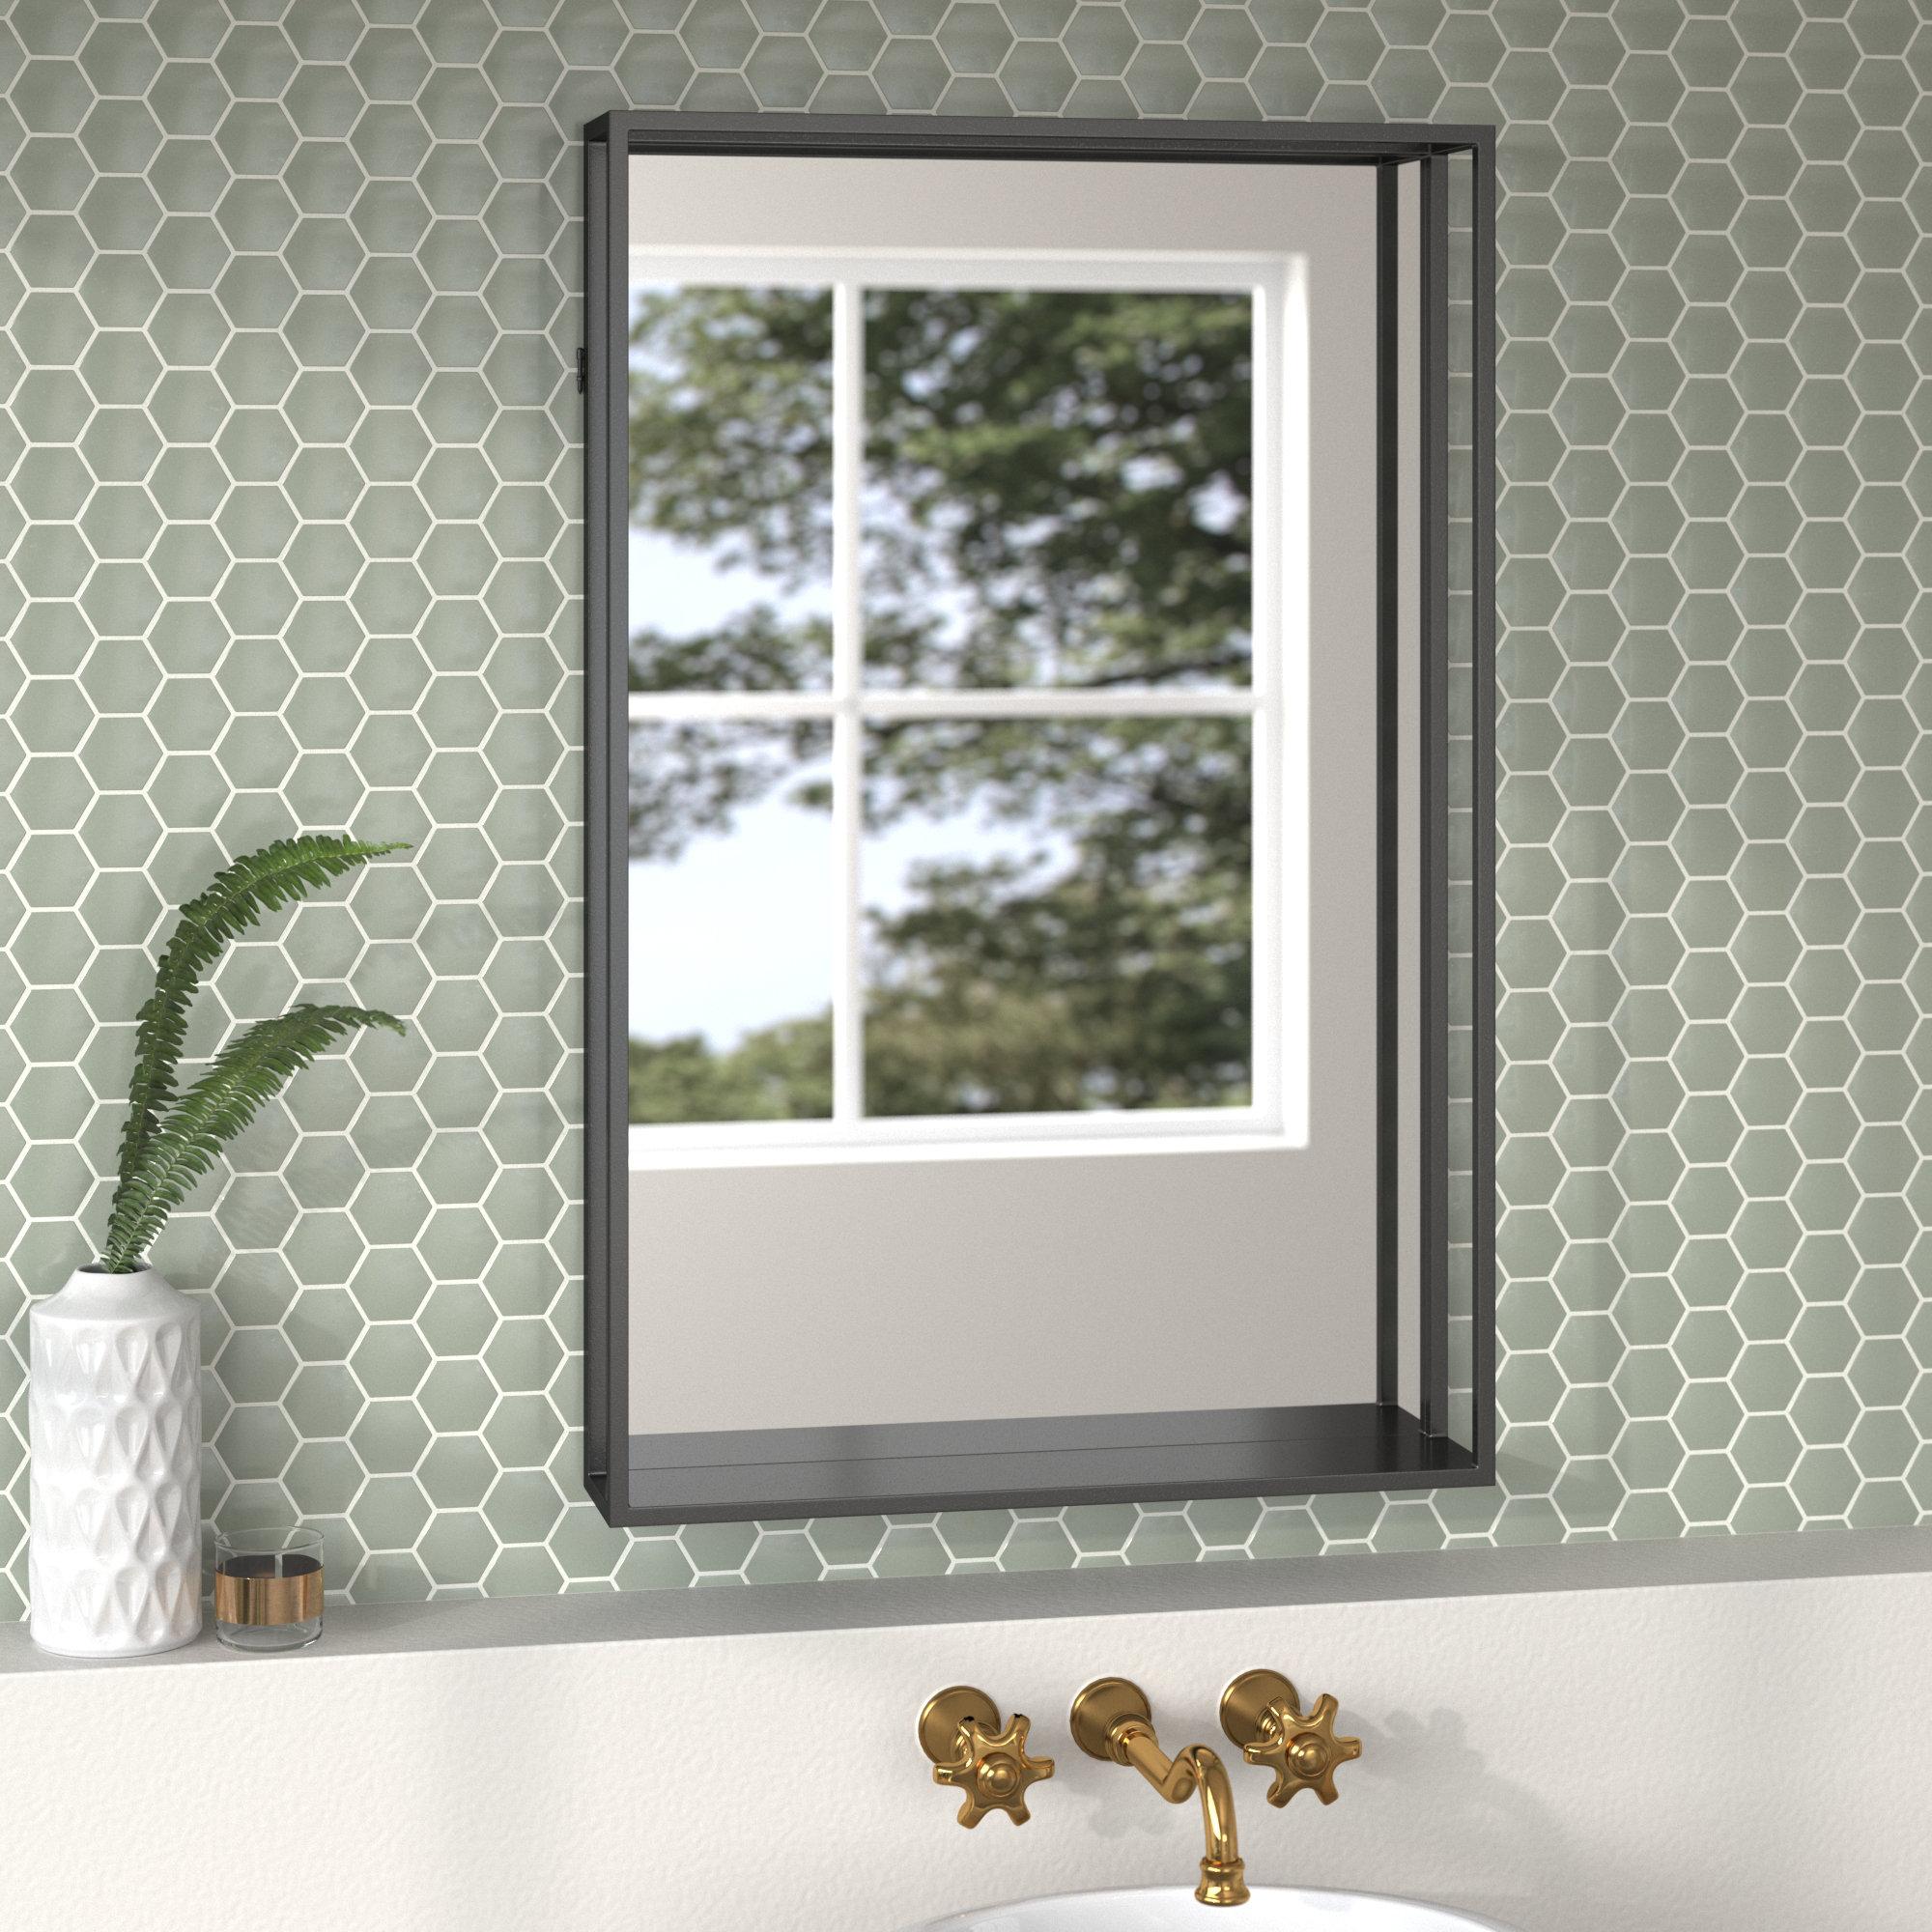 Joss Main Alaina Glam Beveled With Shelves Accent And Bathroom Vanity Mirror Reviews Wayfair